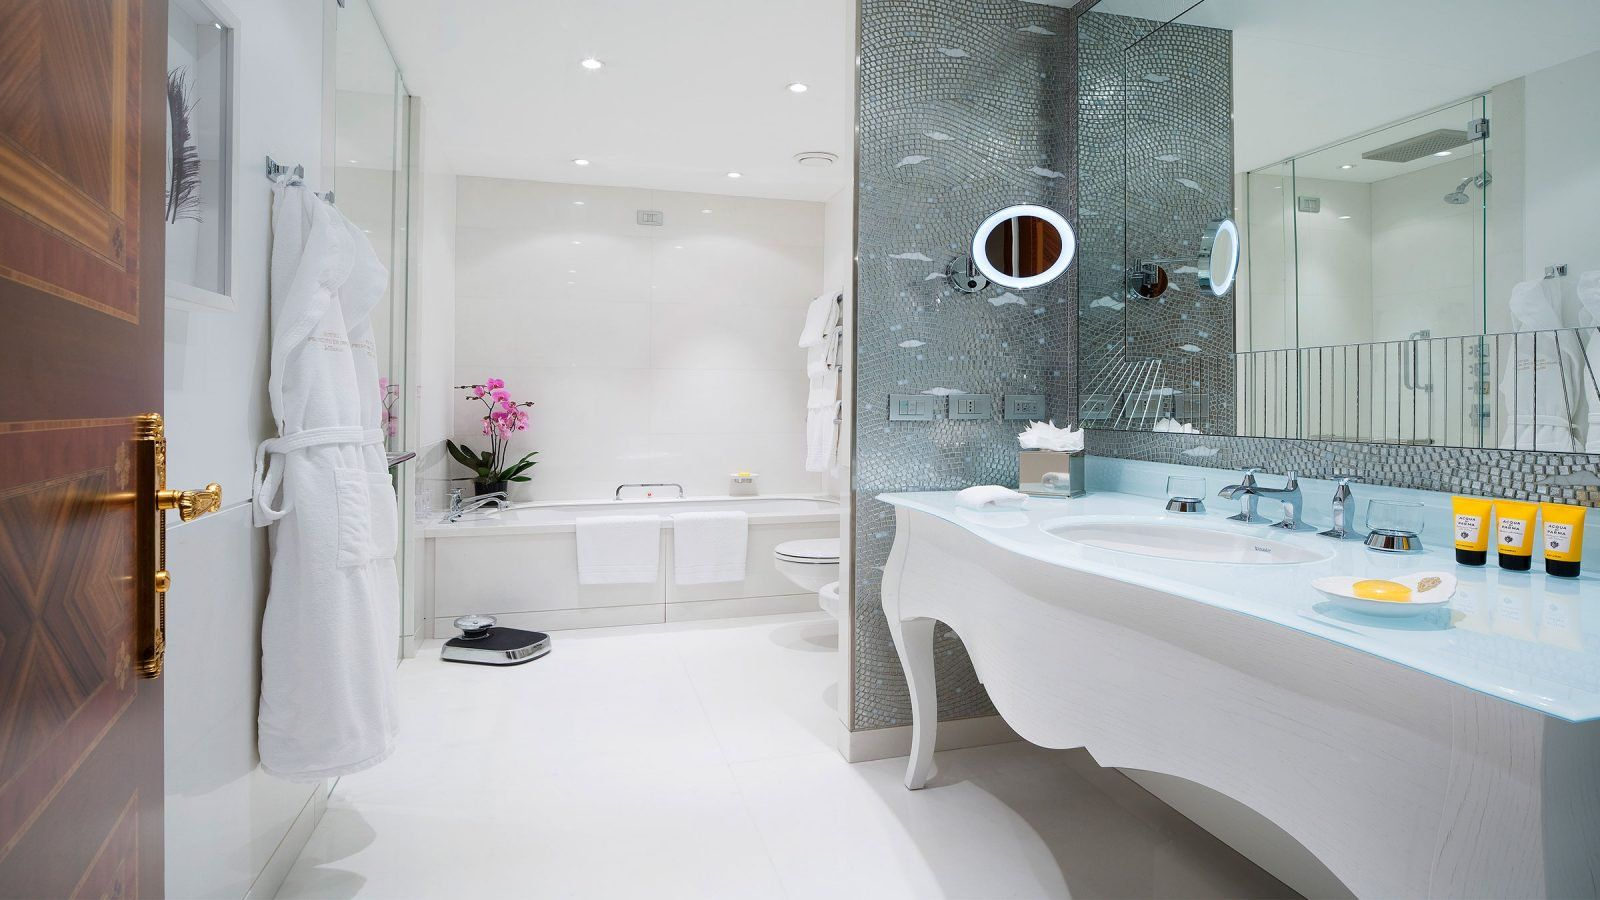 Junior suite at hotel principe di savoia dorchester